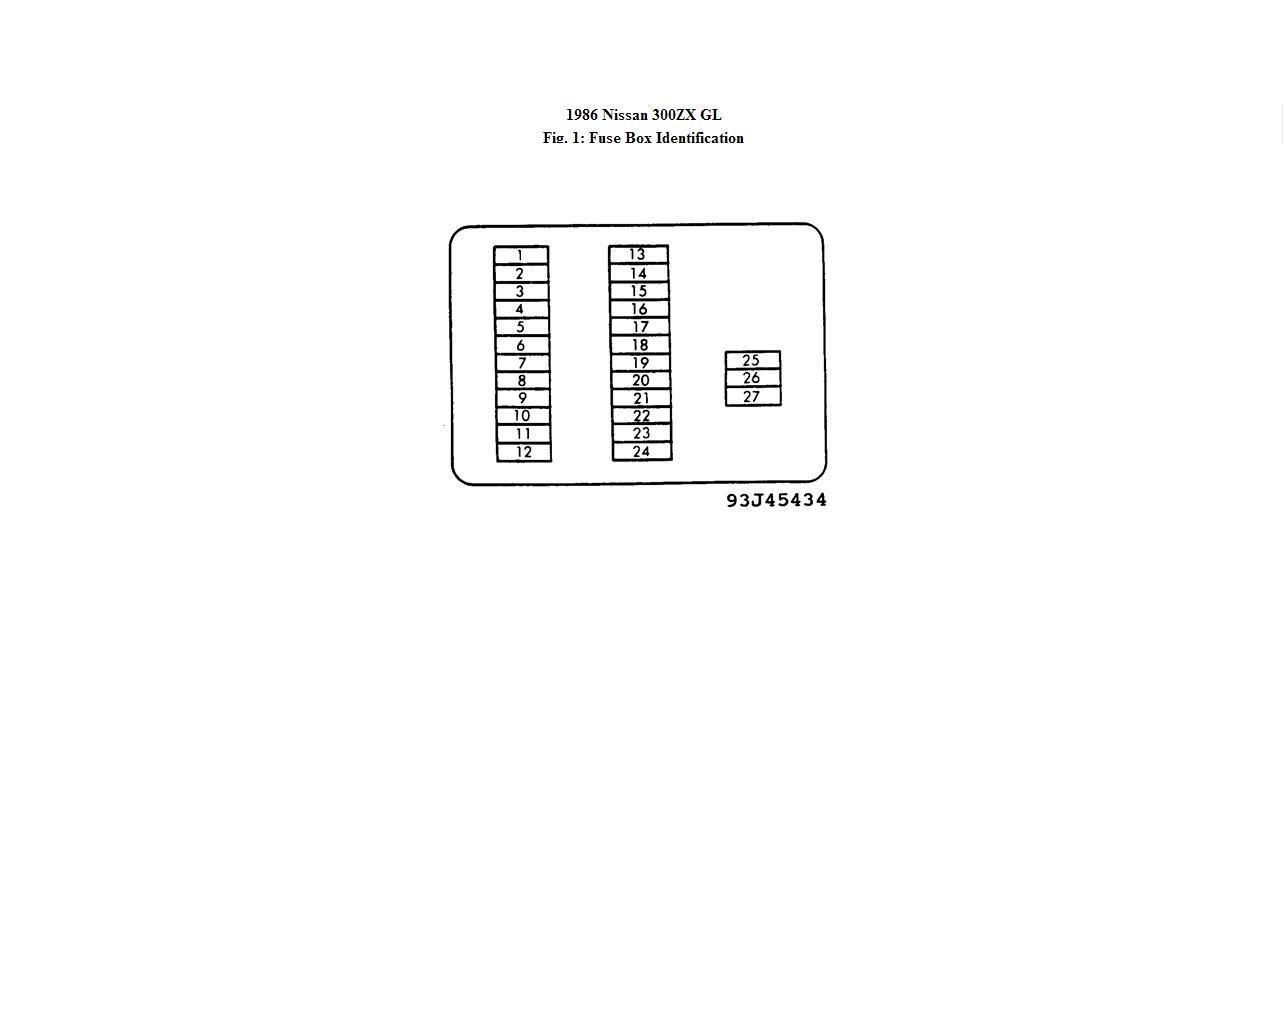 Fantastic 85 300Zx Fuse Box Wiring Diagram Wiring Cloud Histehirlexornumapkesianilluminateatxorg